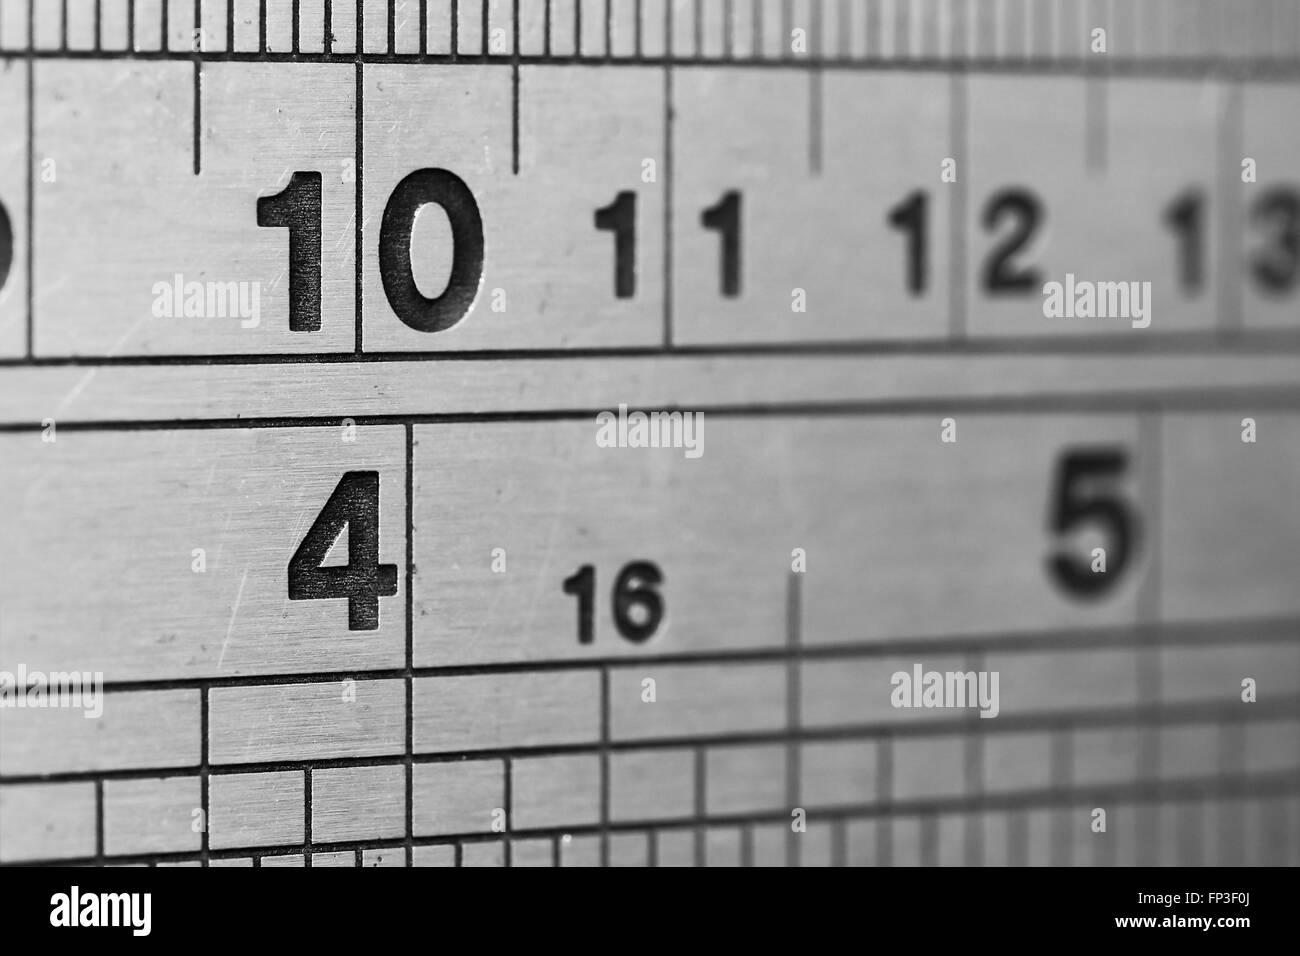 Ruler for Measuring - Stock Image